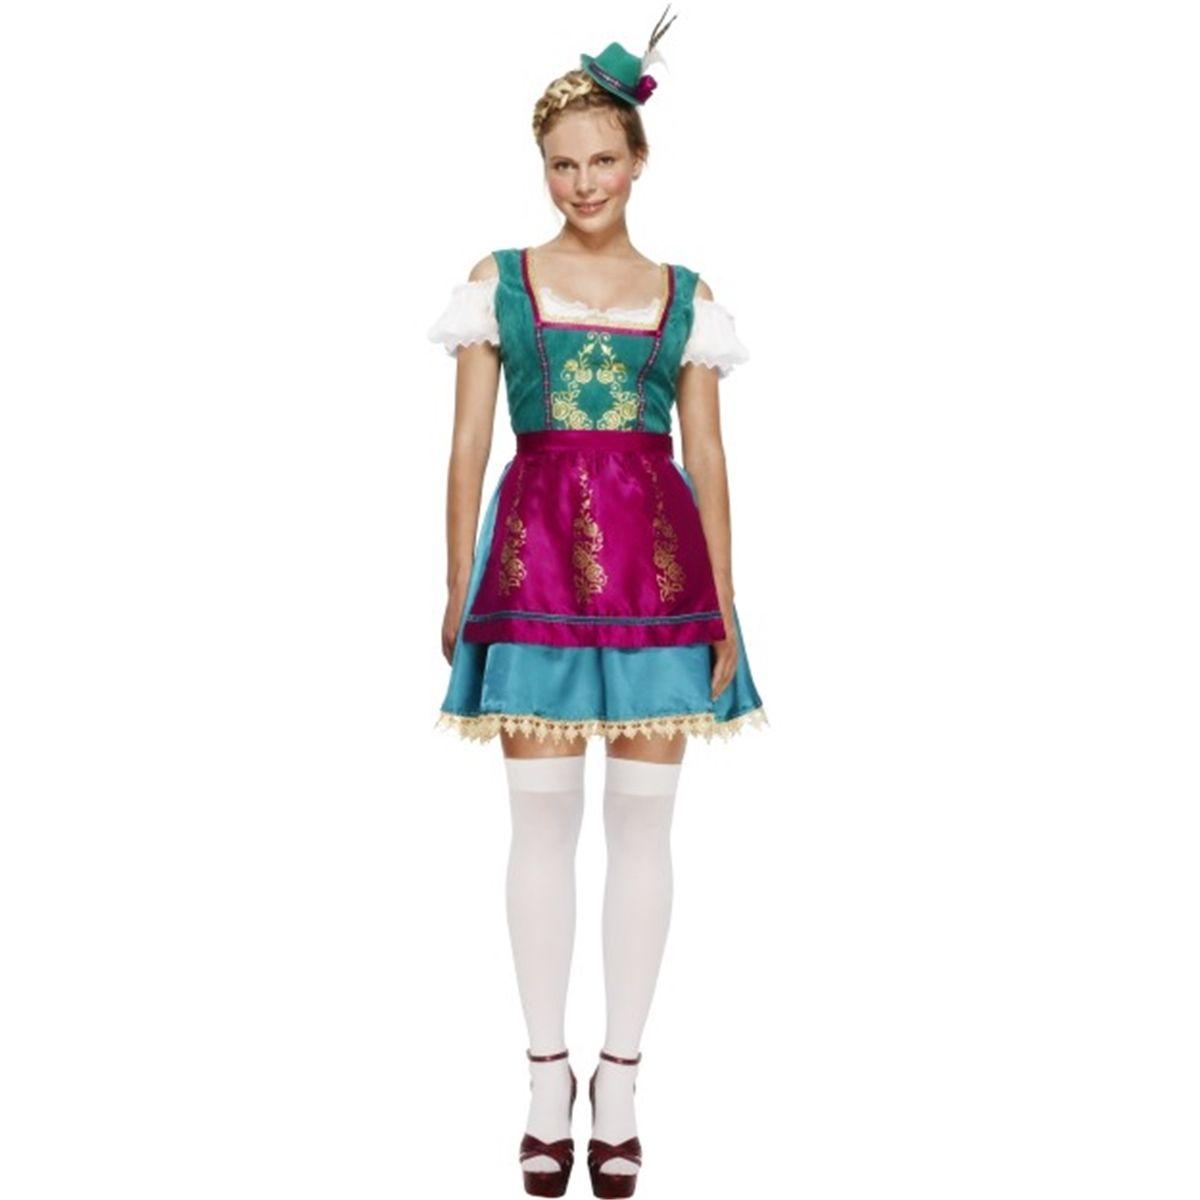 Fever Deluxe Dirndl Costume  060c5183726